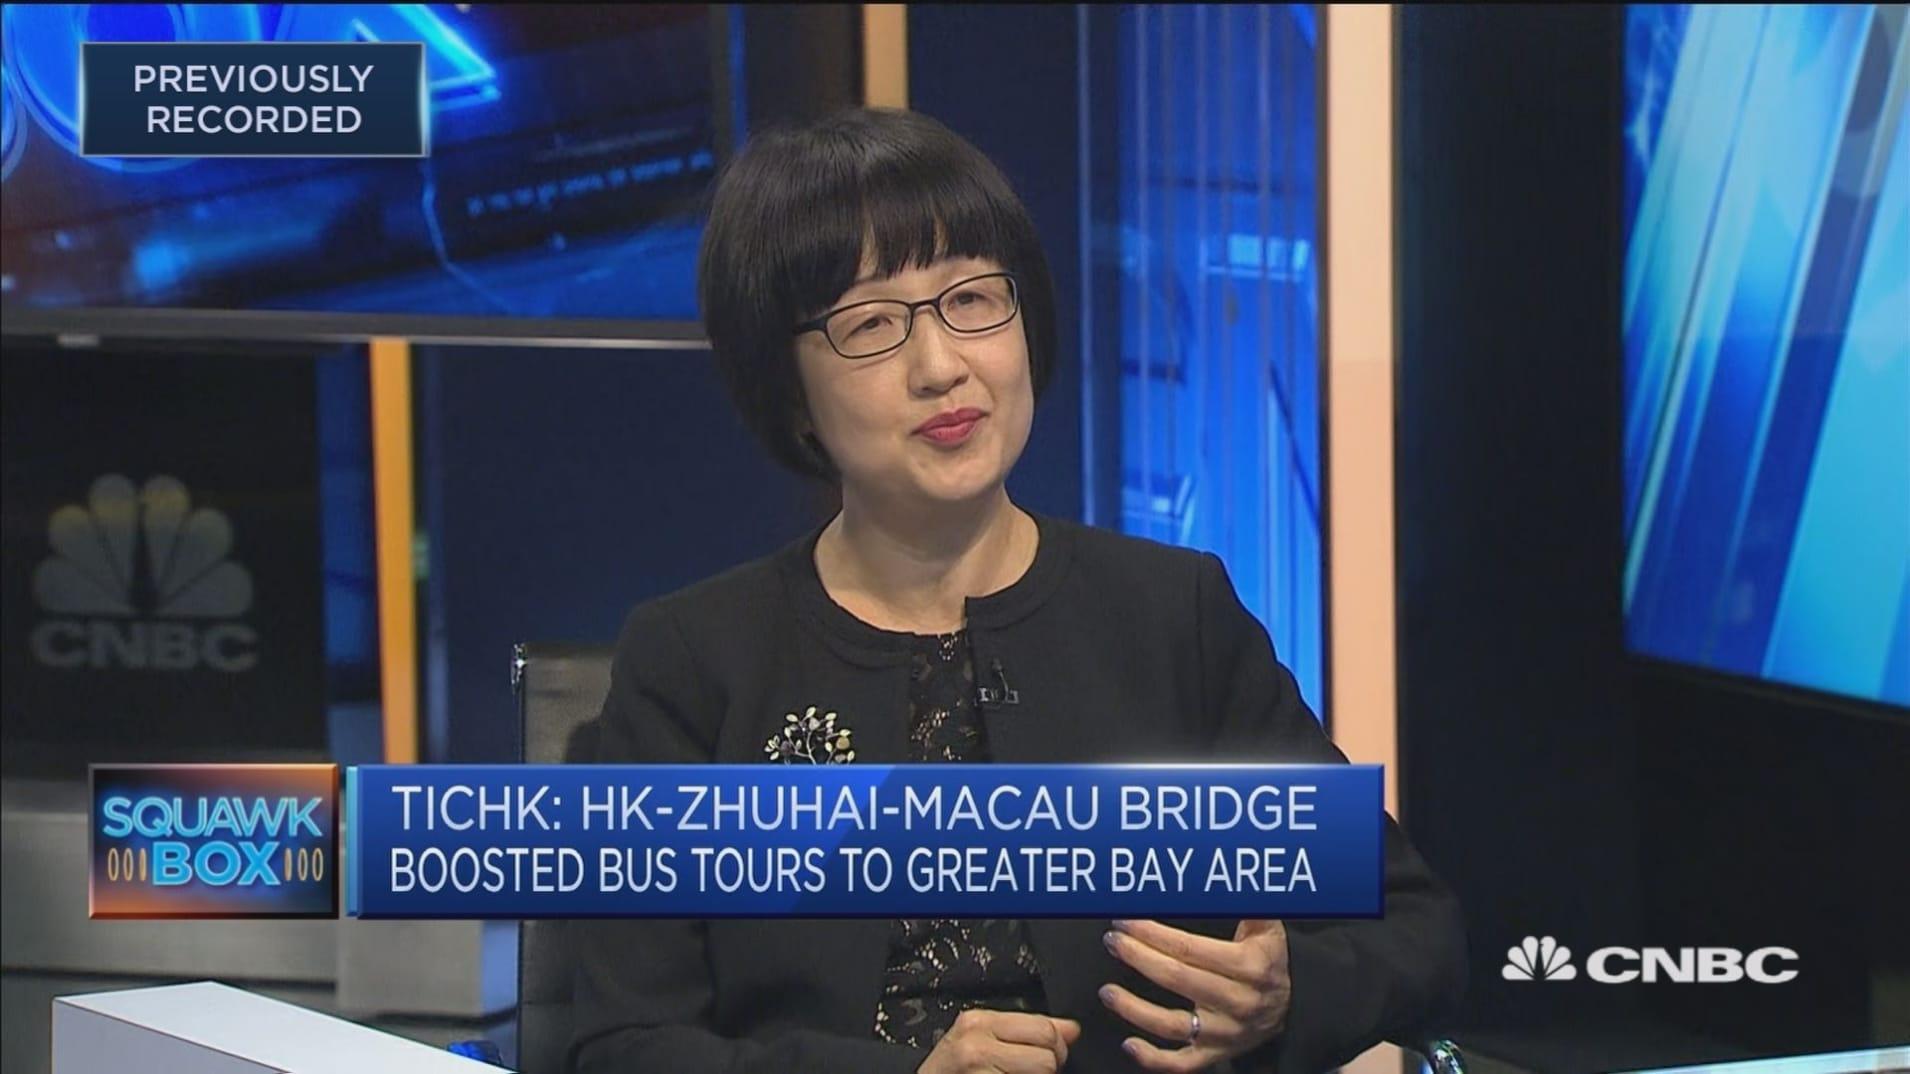 Hong Kong has seen a 'huge increase' in Mainland visitors: TICHK